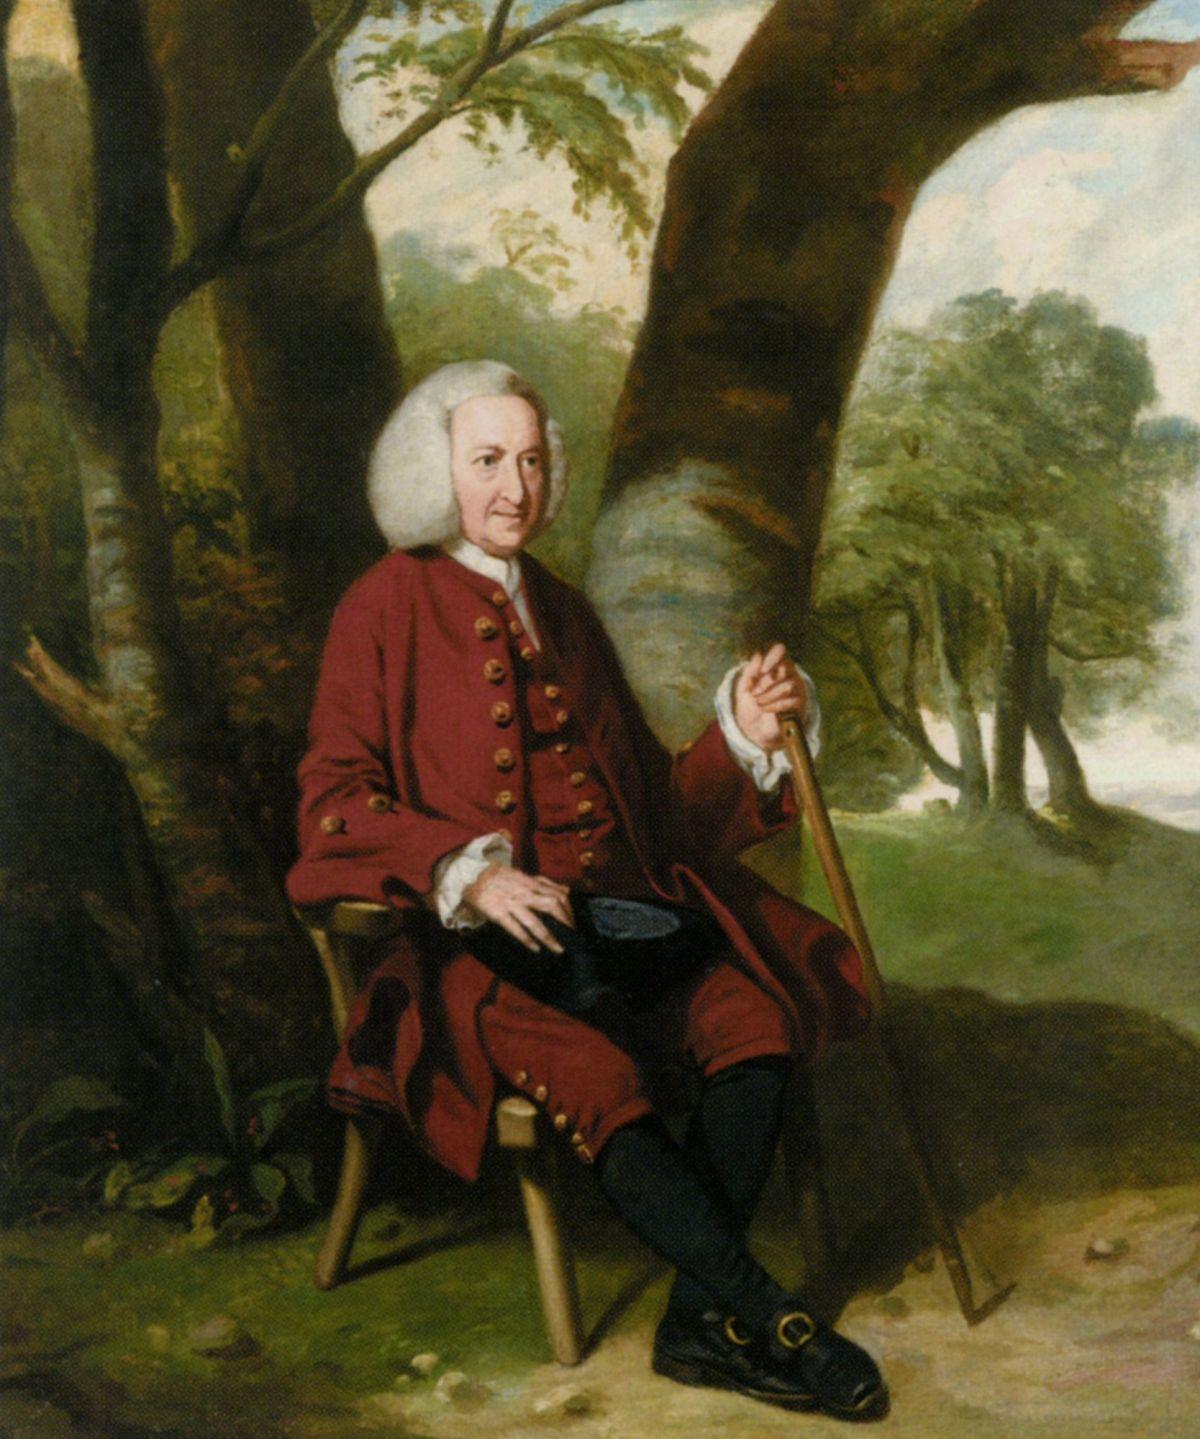 Portrait-of-Dr.-Thomas-Hanson-of-Canterbury-by-Johann-Zoffany